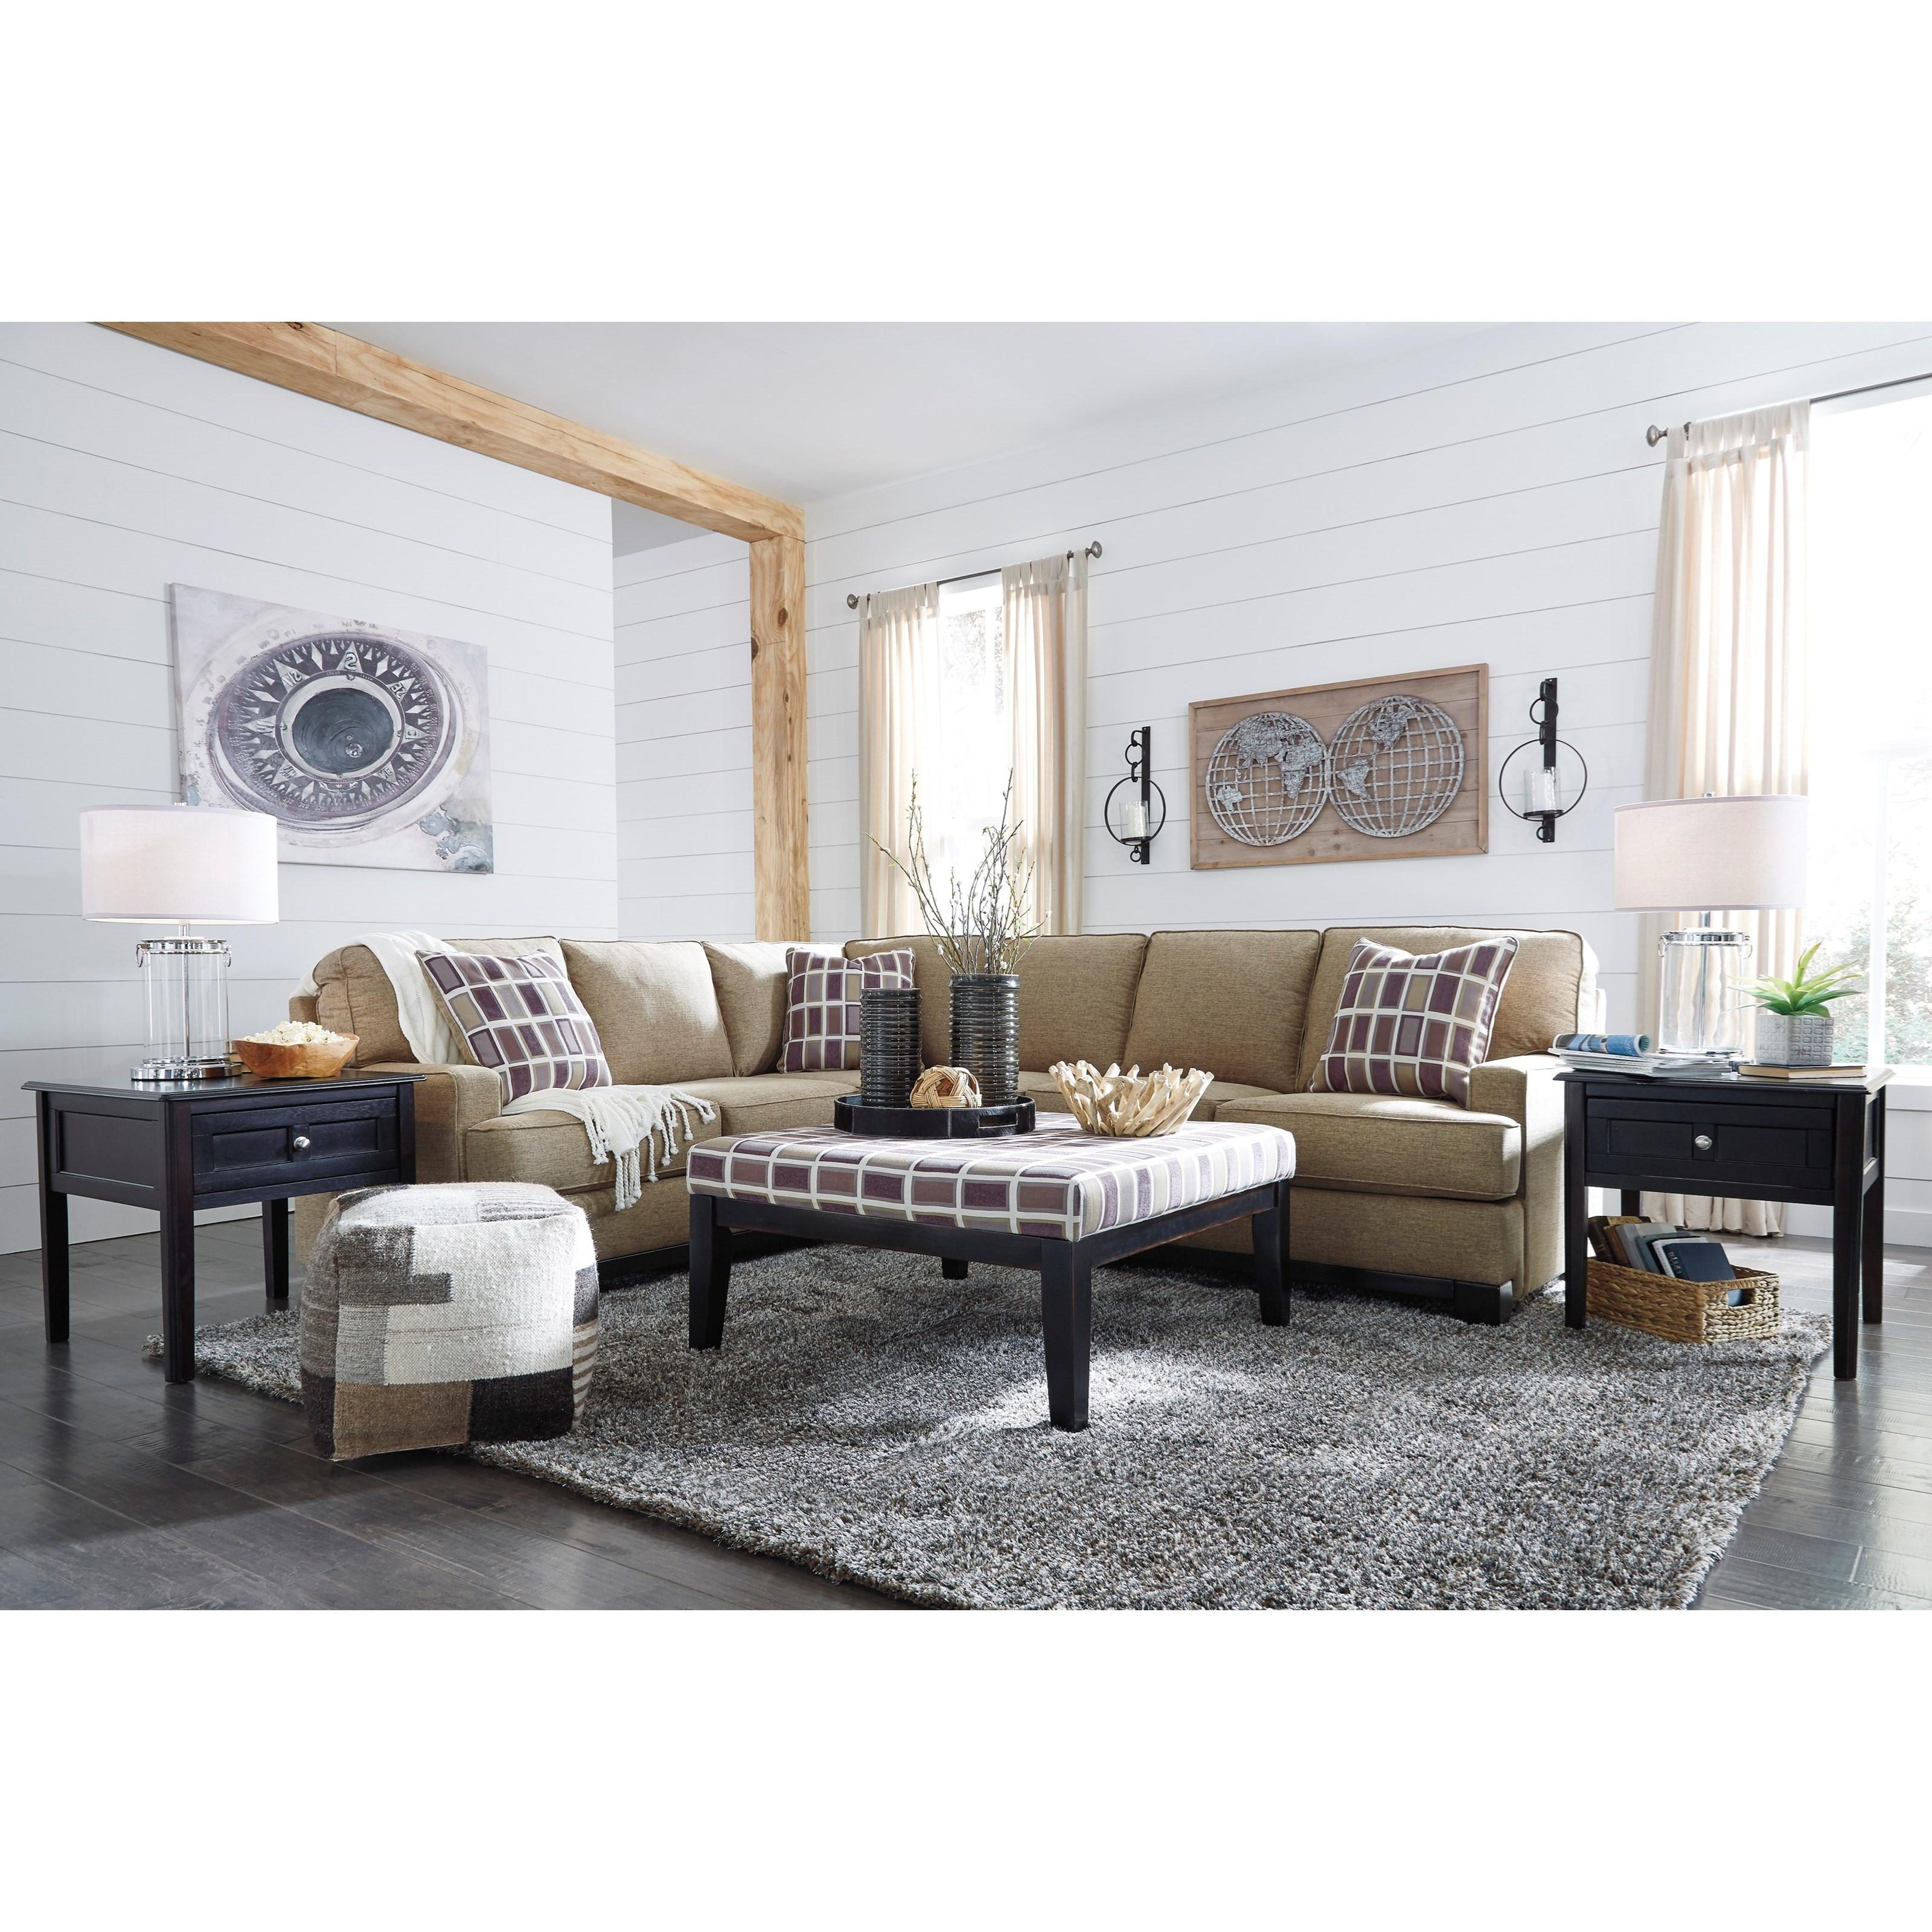 Benchcraft Larkhaven Stationary Living Room Group - Item Number: 81902 Living Room Group 1